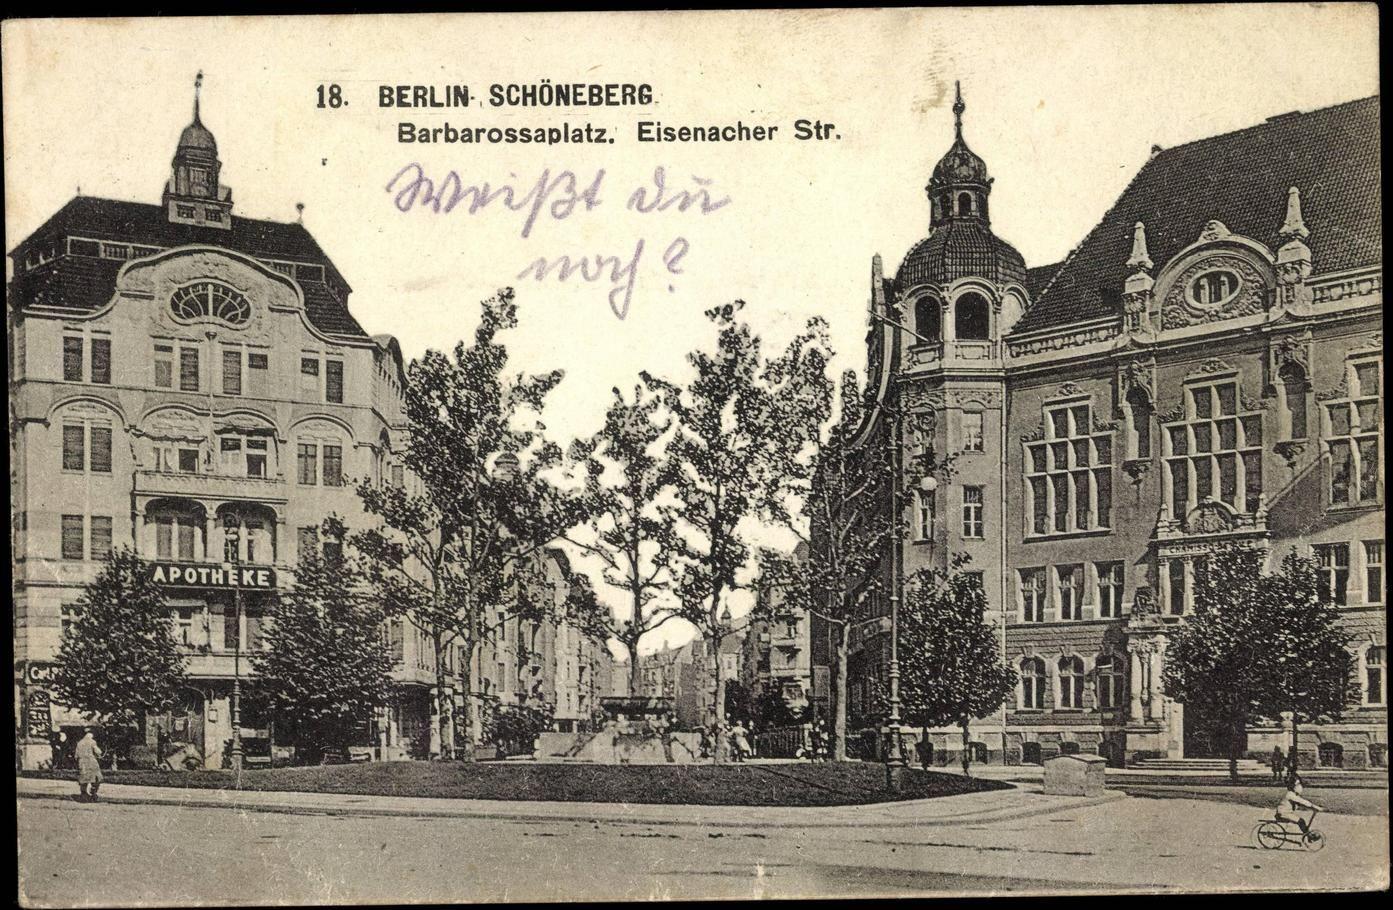 Berlin Nachrichten Meldungen Aus Berlin Europaische Geschichte Bilder Geschichte